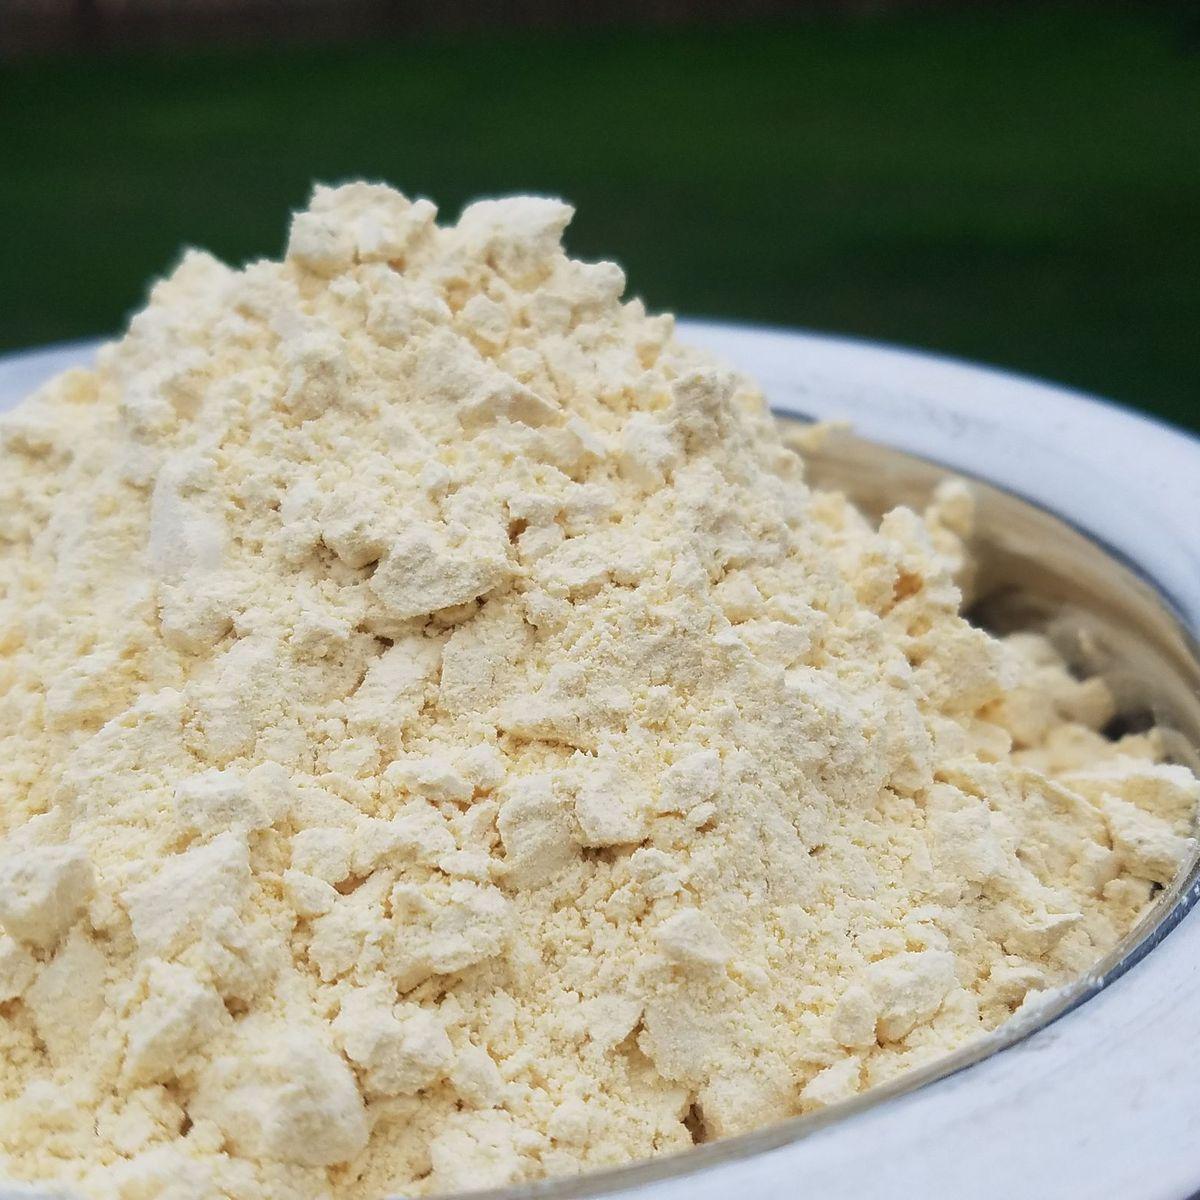 Kadhi -cooking with gram flour!